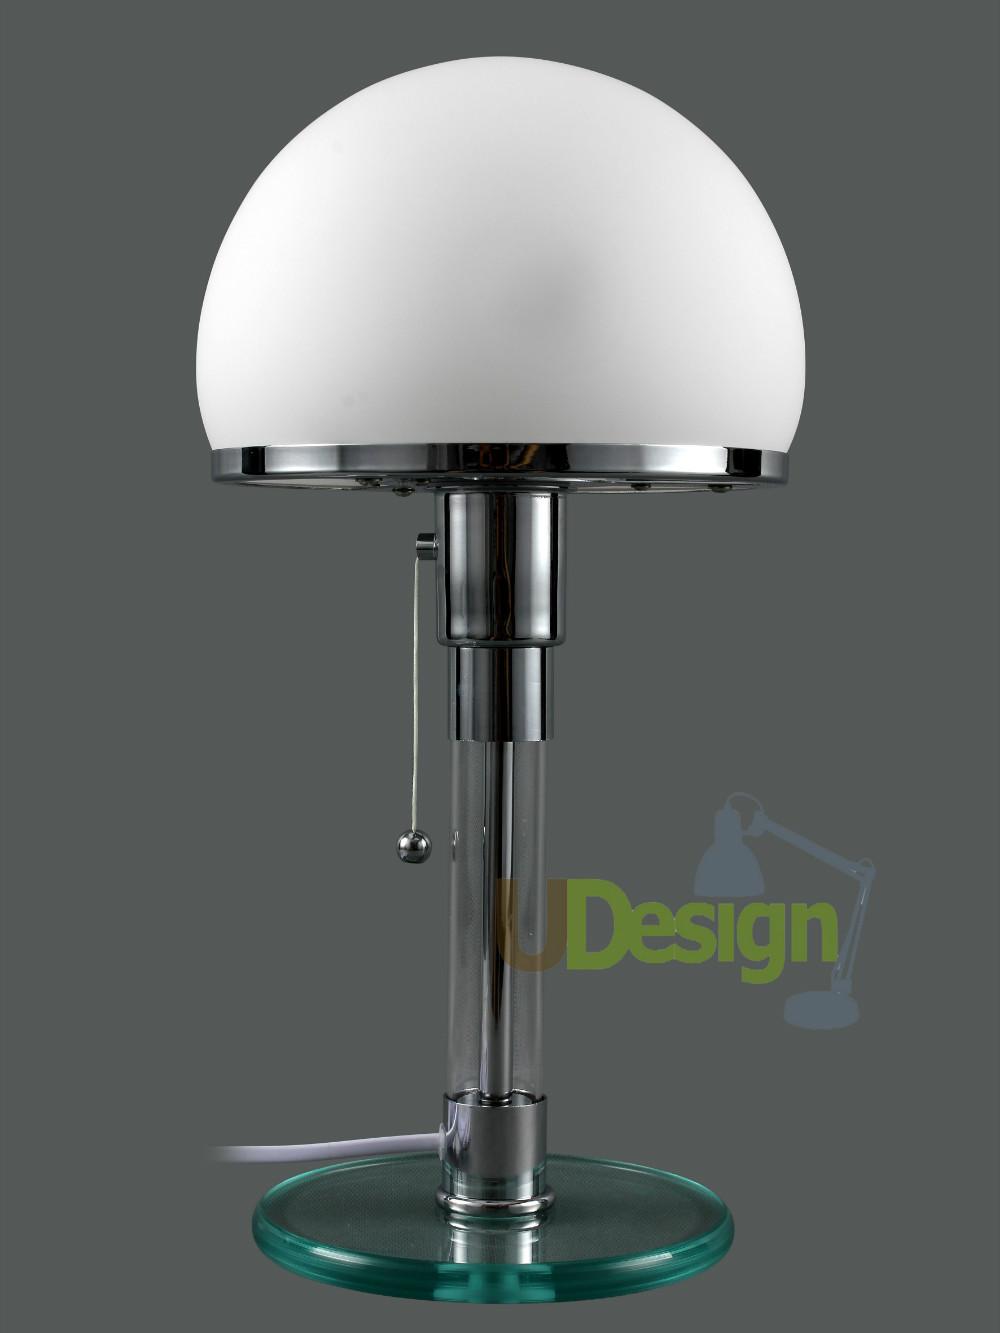 wagenfeld lampe achetez des lots petit prix wagenfeld lampe en provenance de fournisseurs. Black Bedroom Furniture Sets. Home Design Ideas